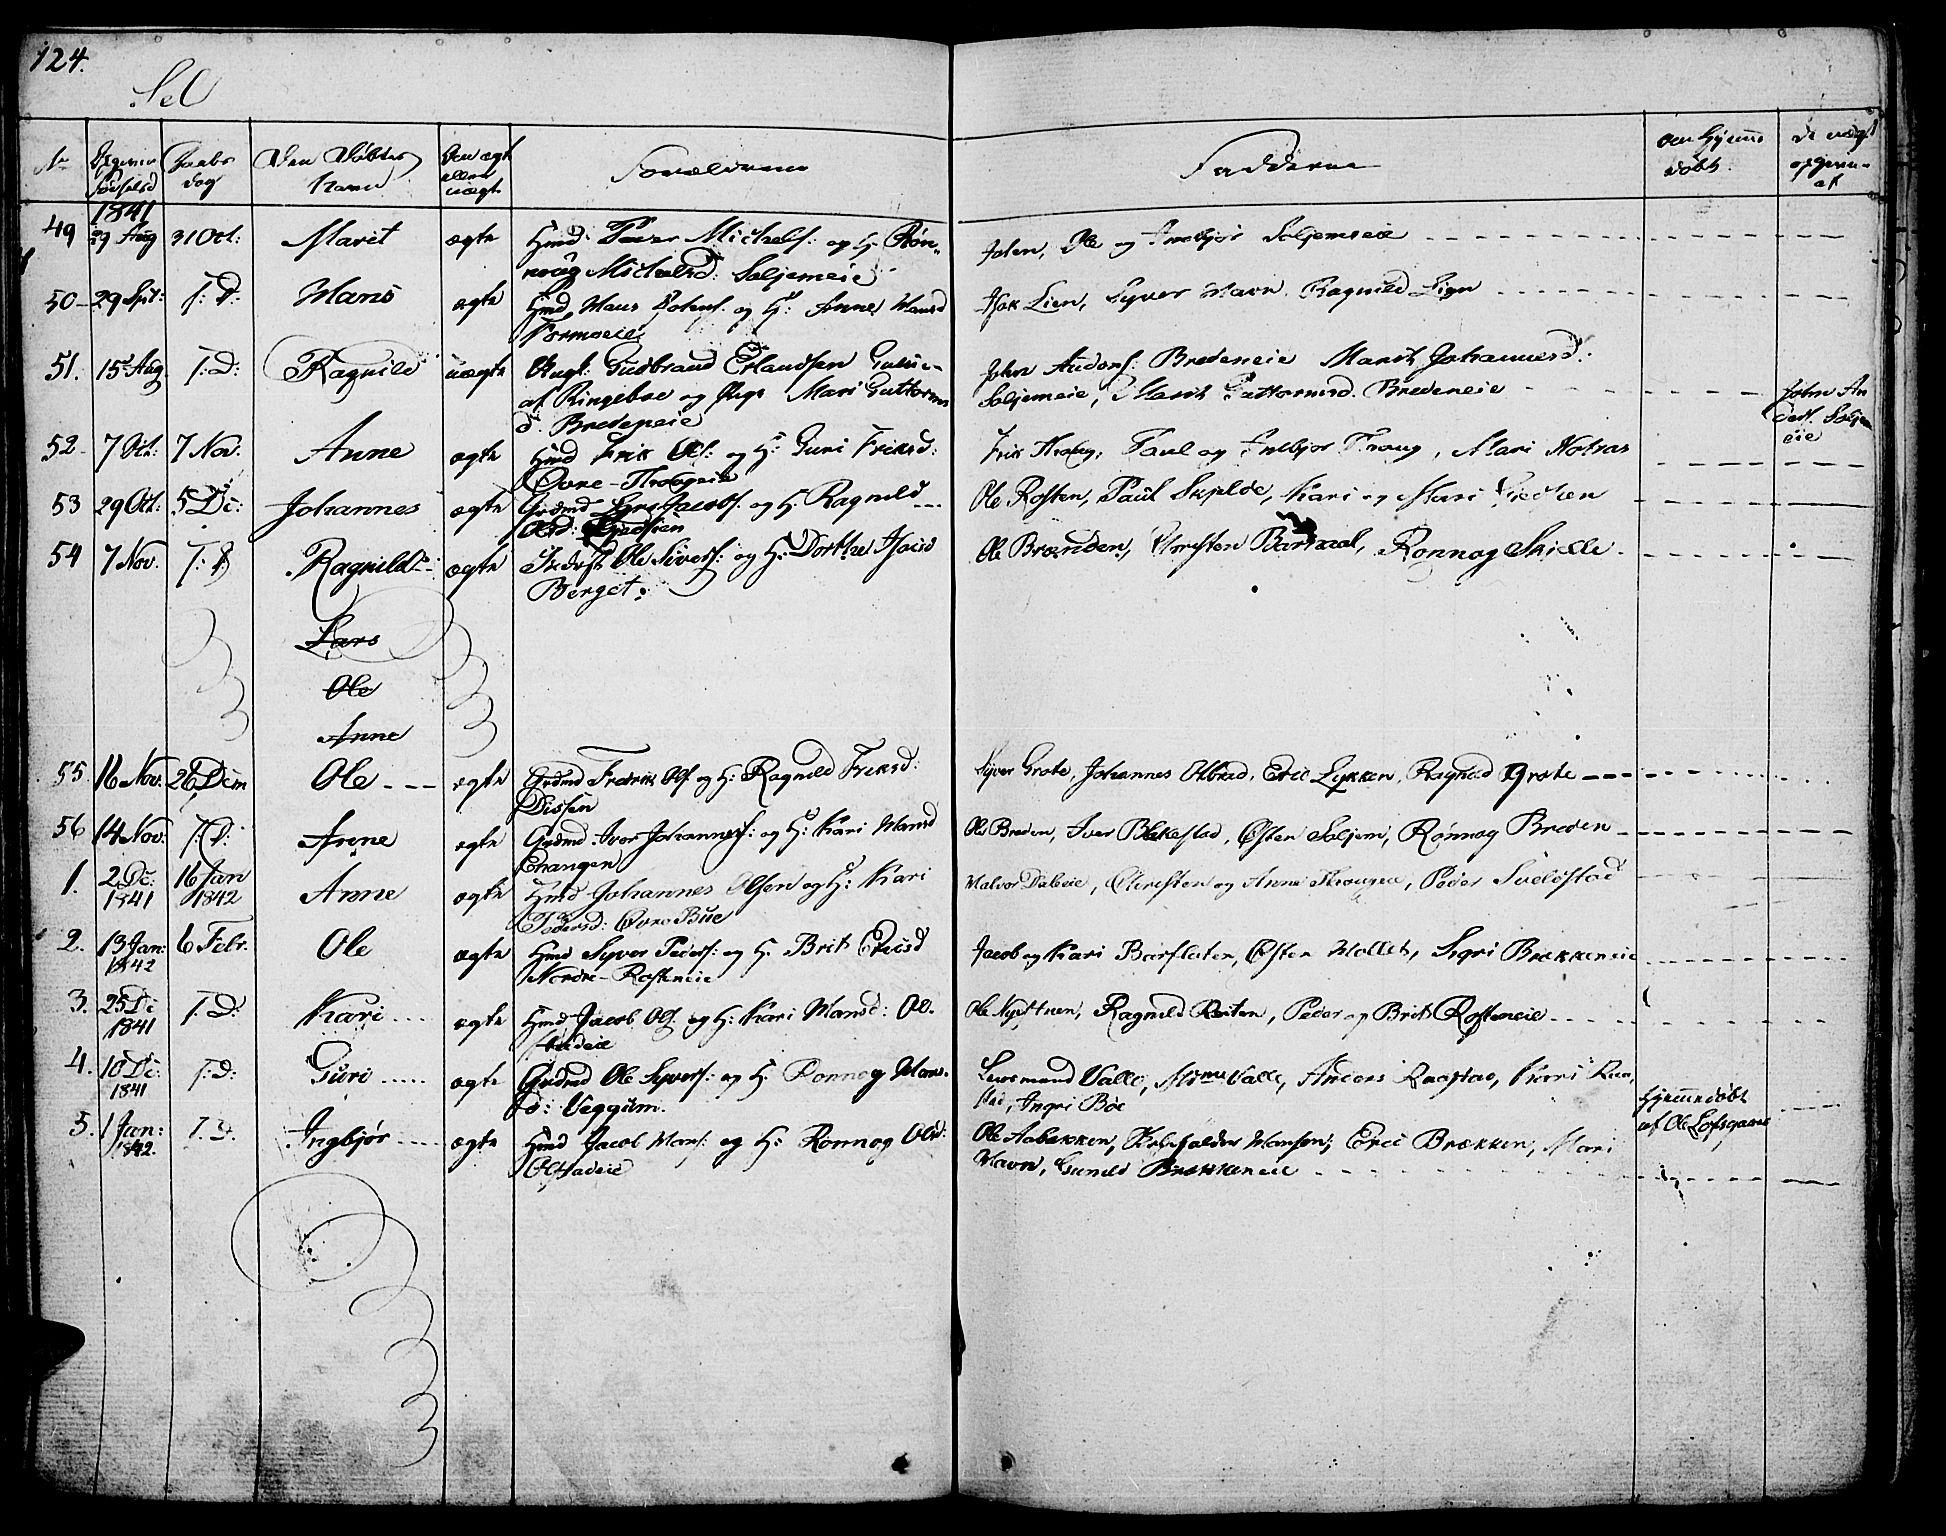 SAH, Vågå prestekontor, Ministerialbok nr. 4 /3, 1834-1842, s. 124